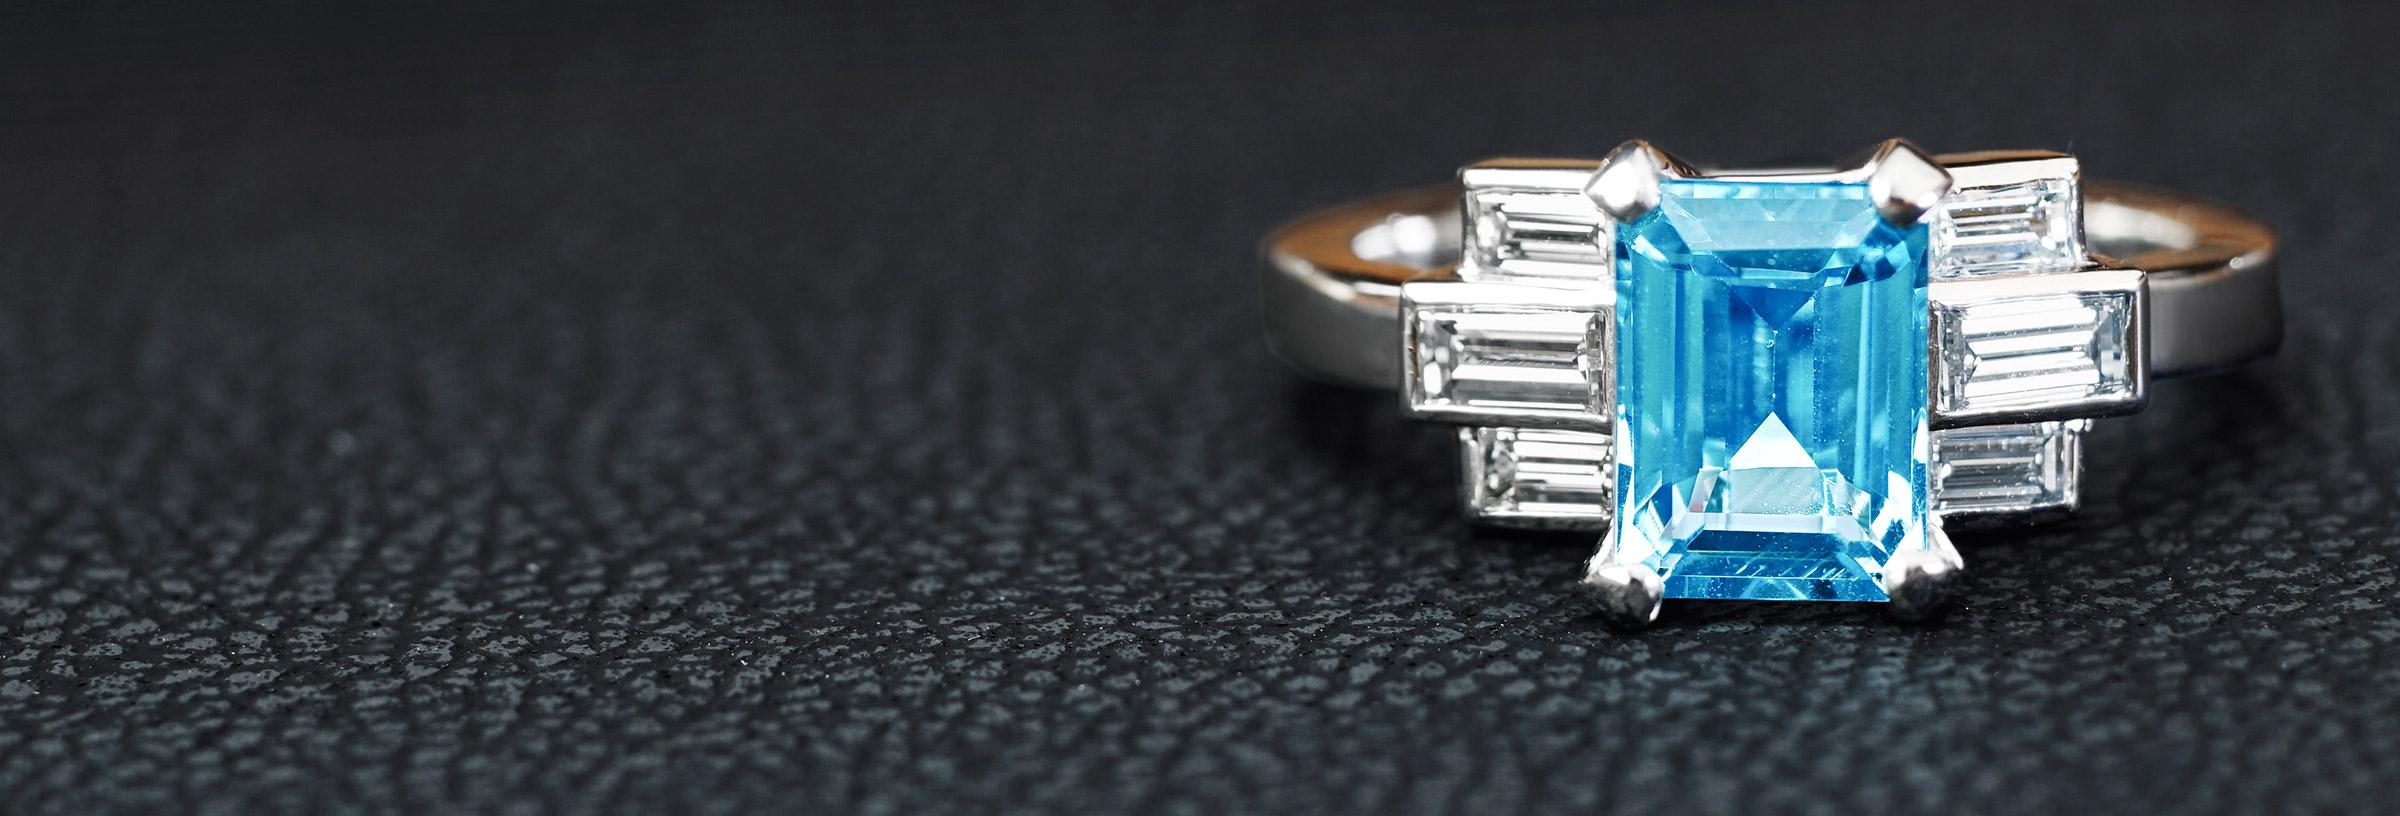 Art Deco inspired 1.45ct aquamarine and 0.50ct diamond ring